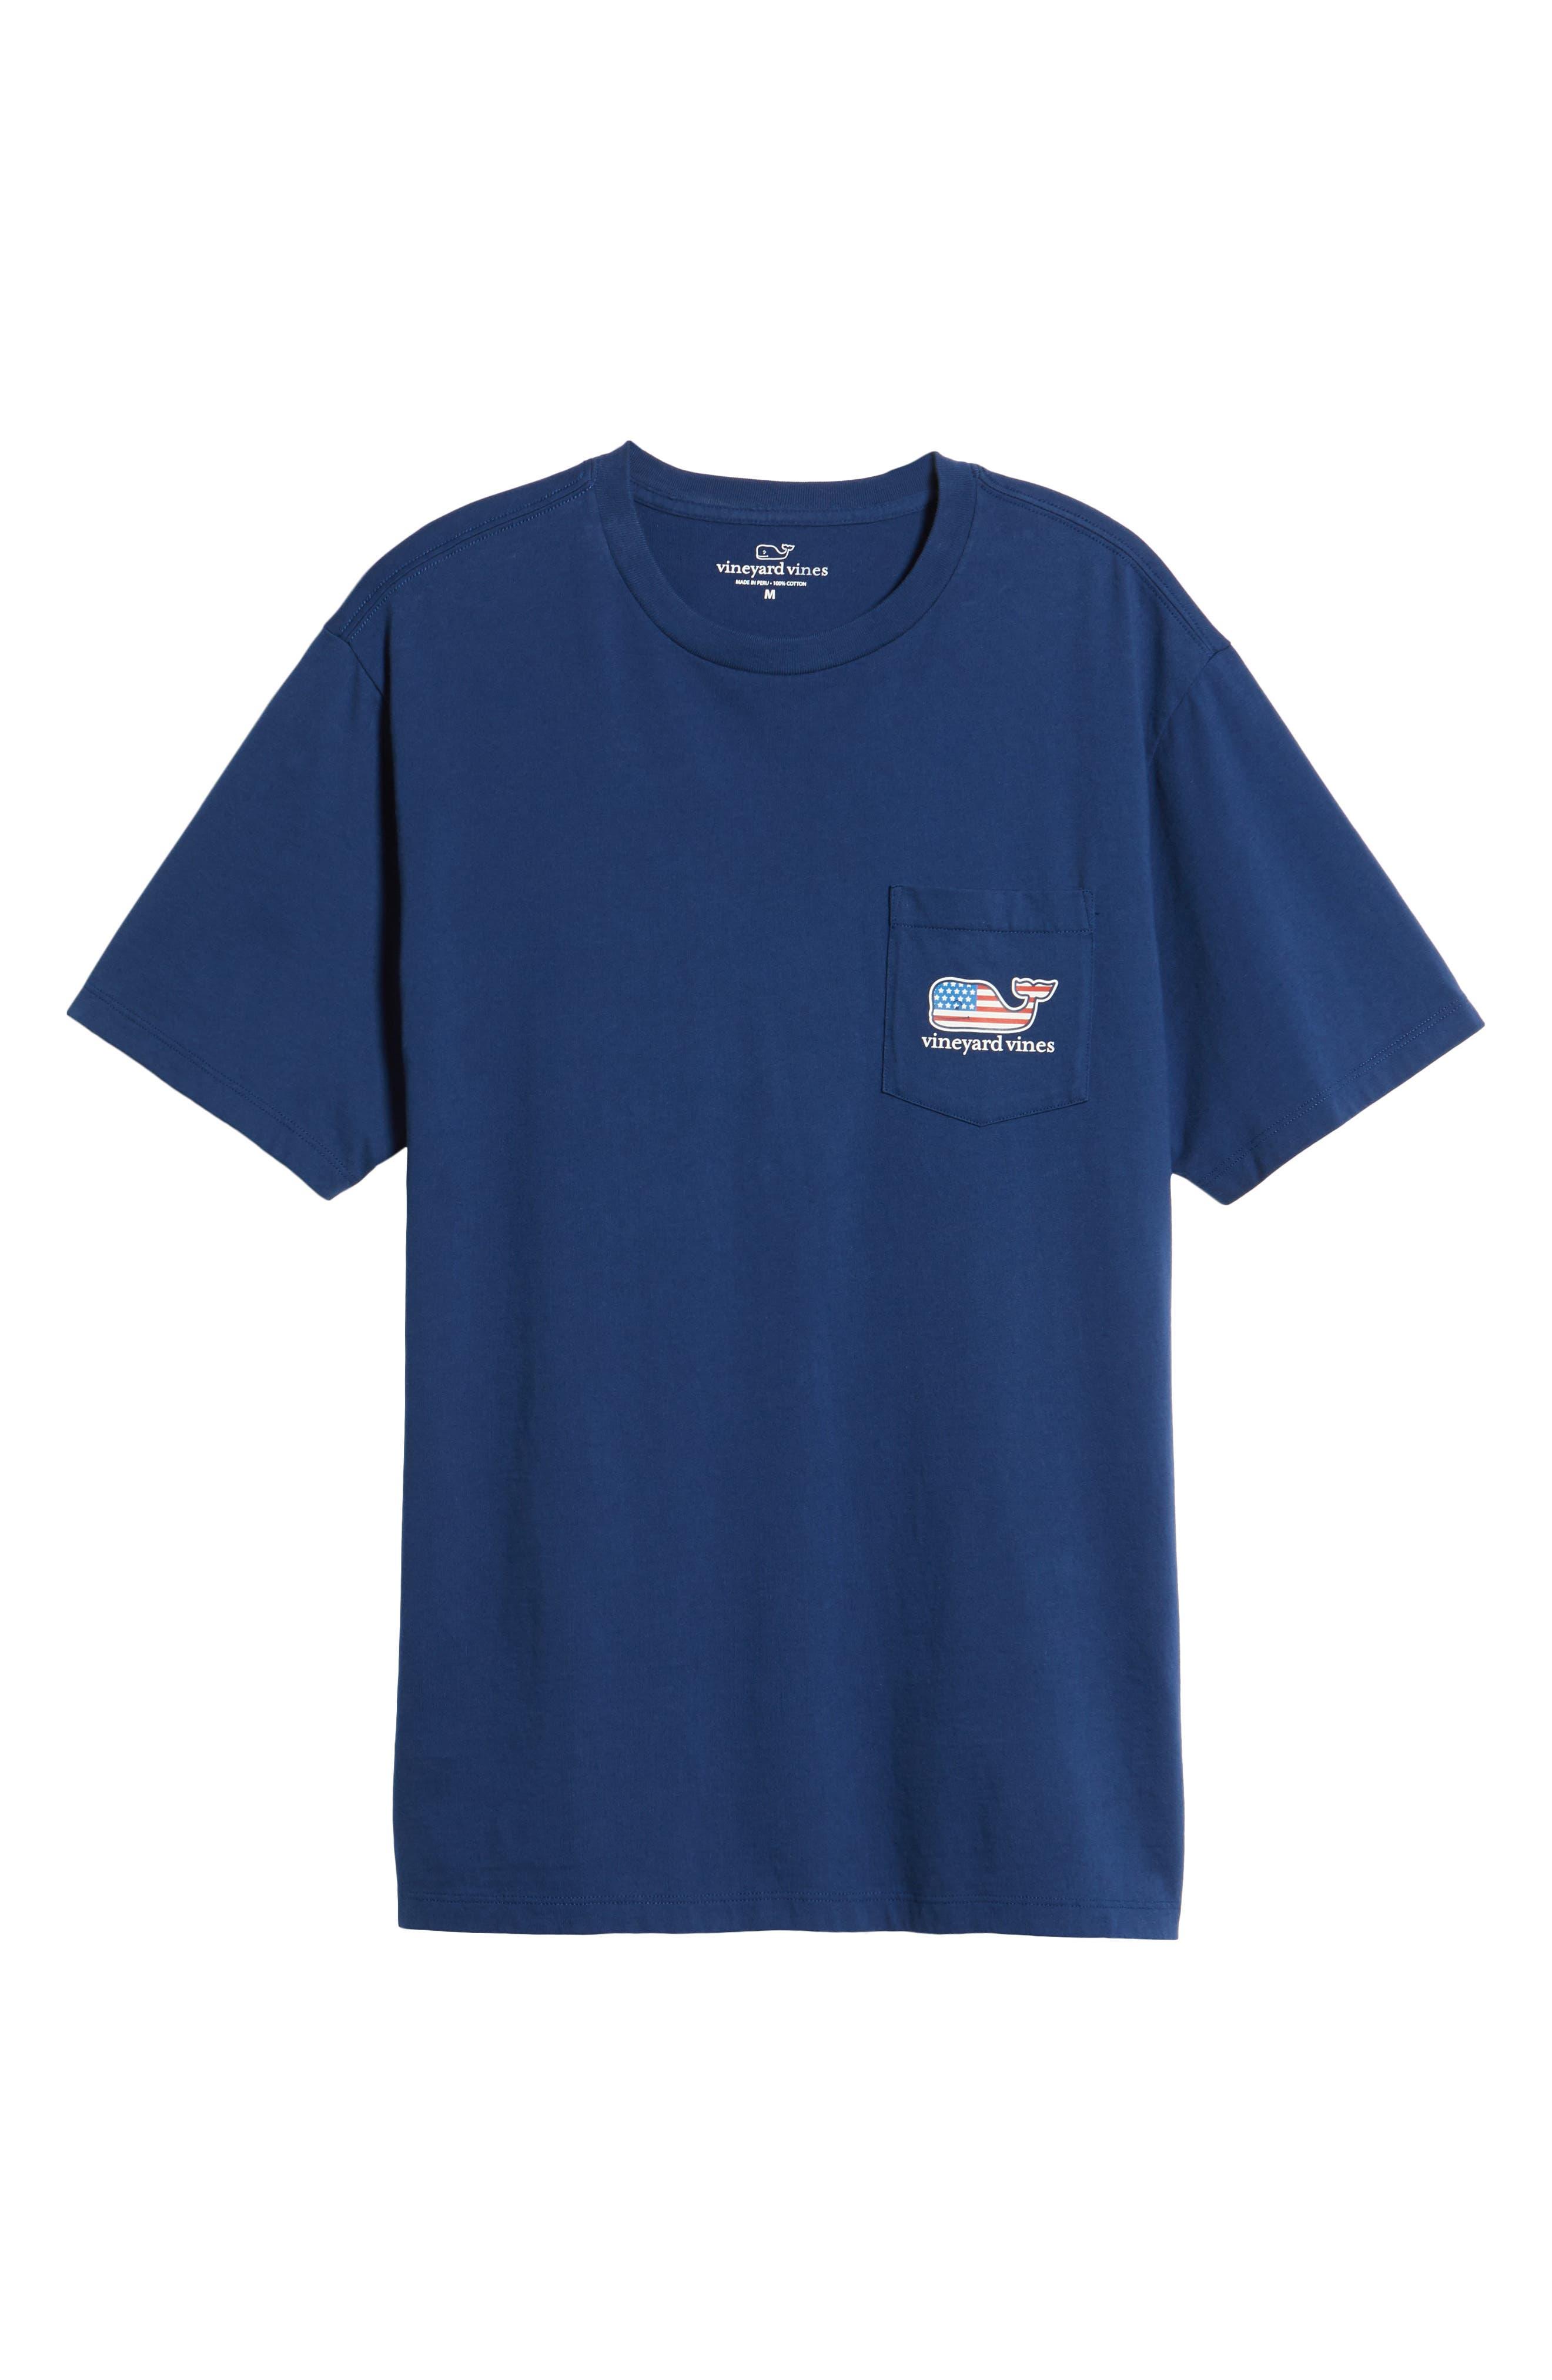 U.S. Tradition Pocket T-Shirt,                             Alternate thumbnail 6, color,                             400